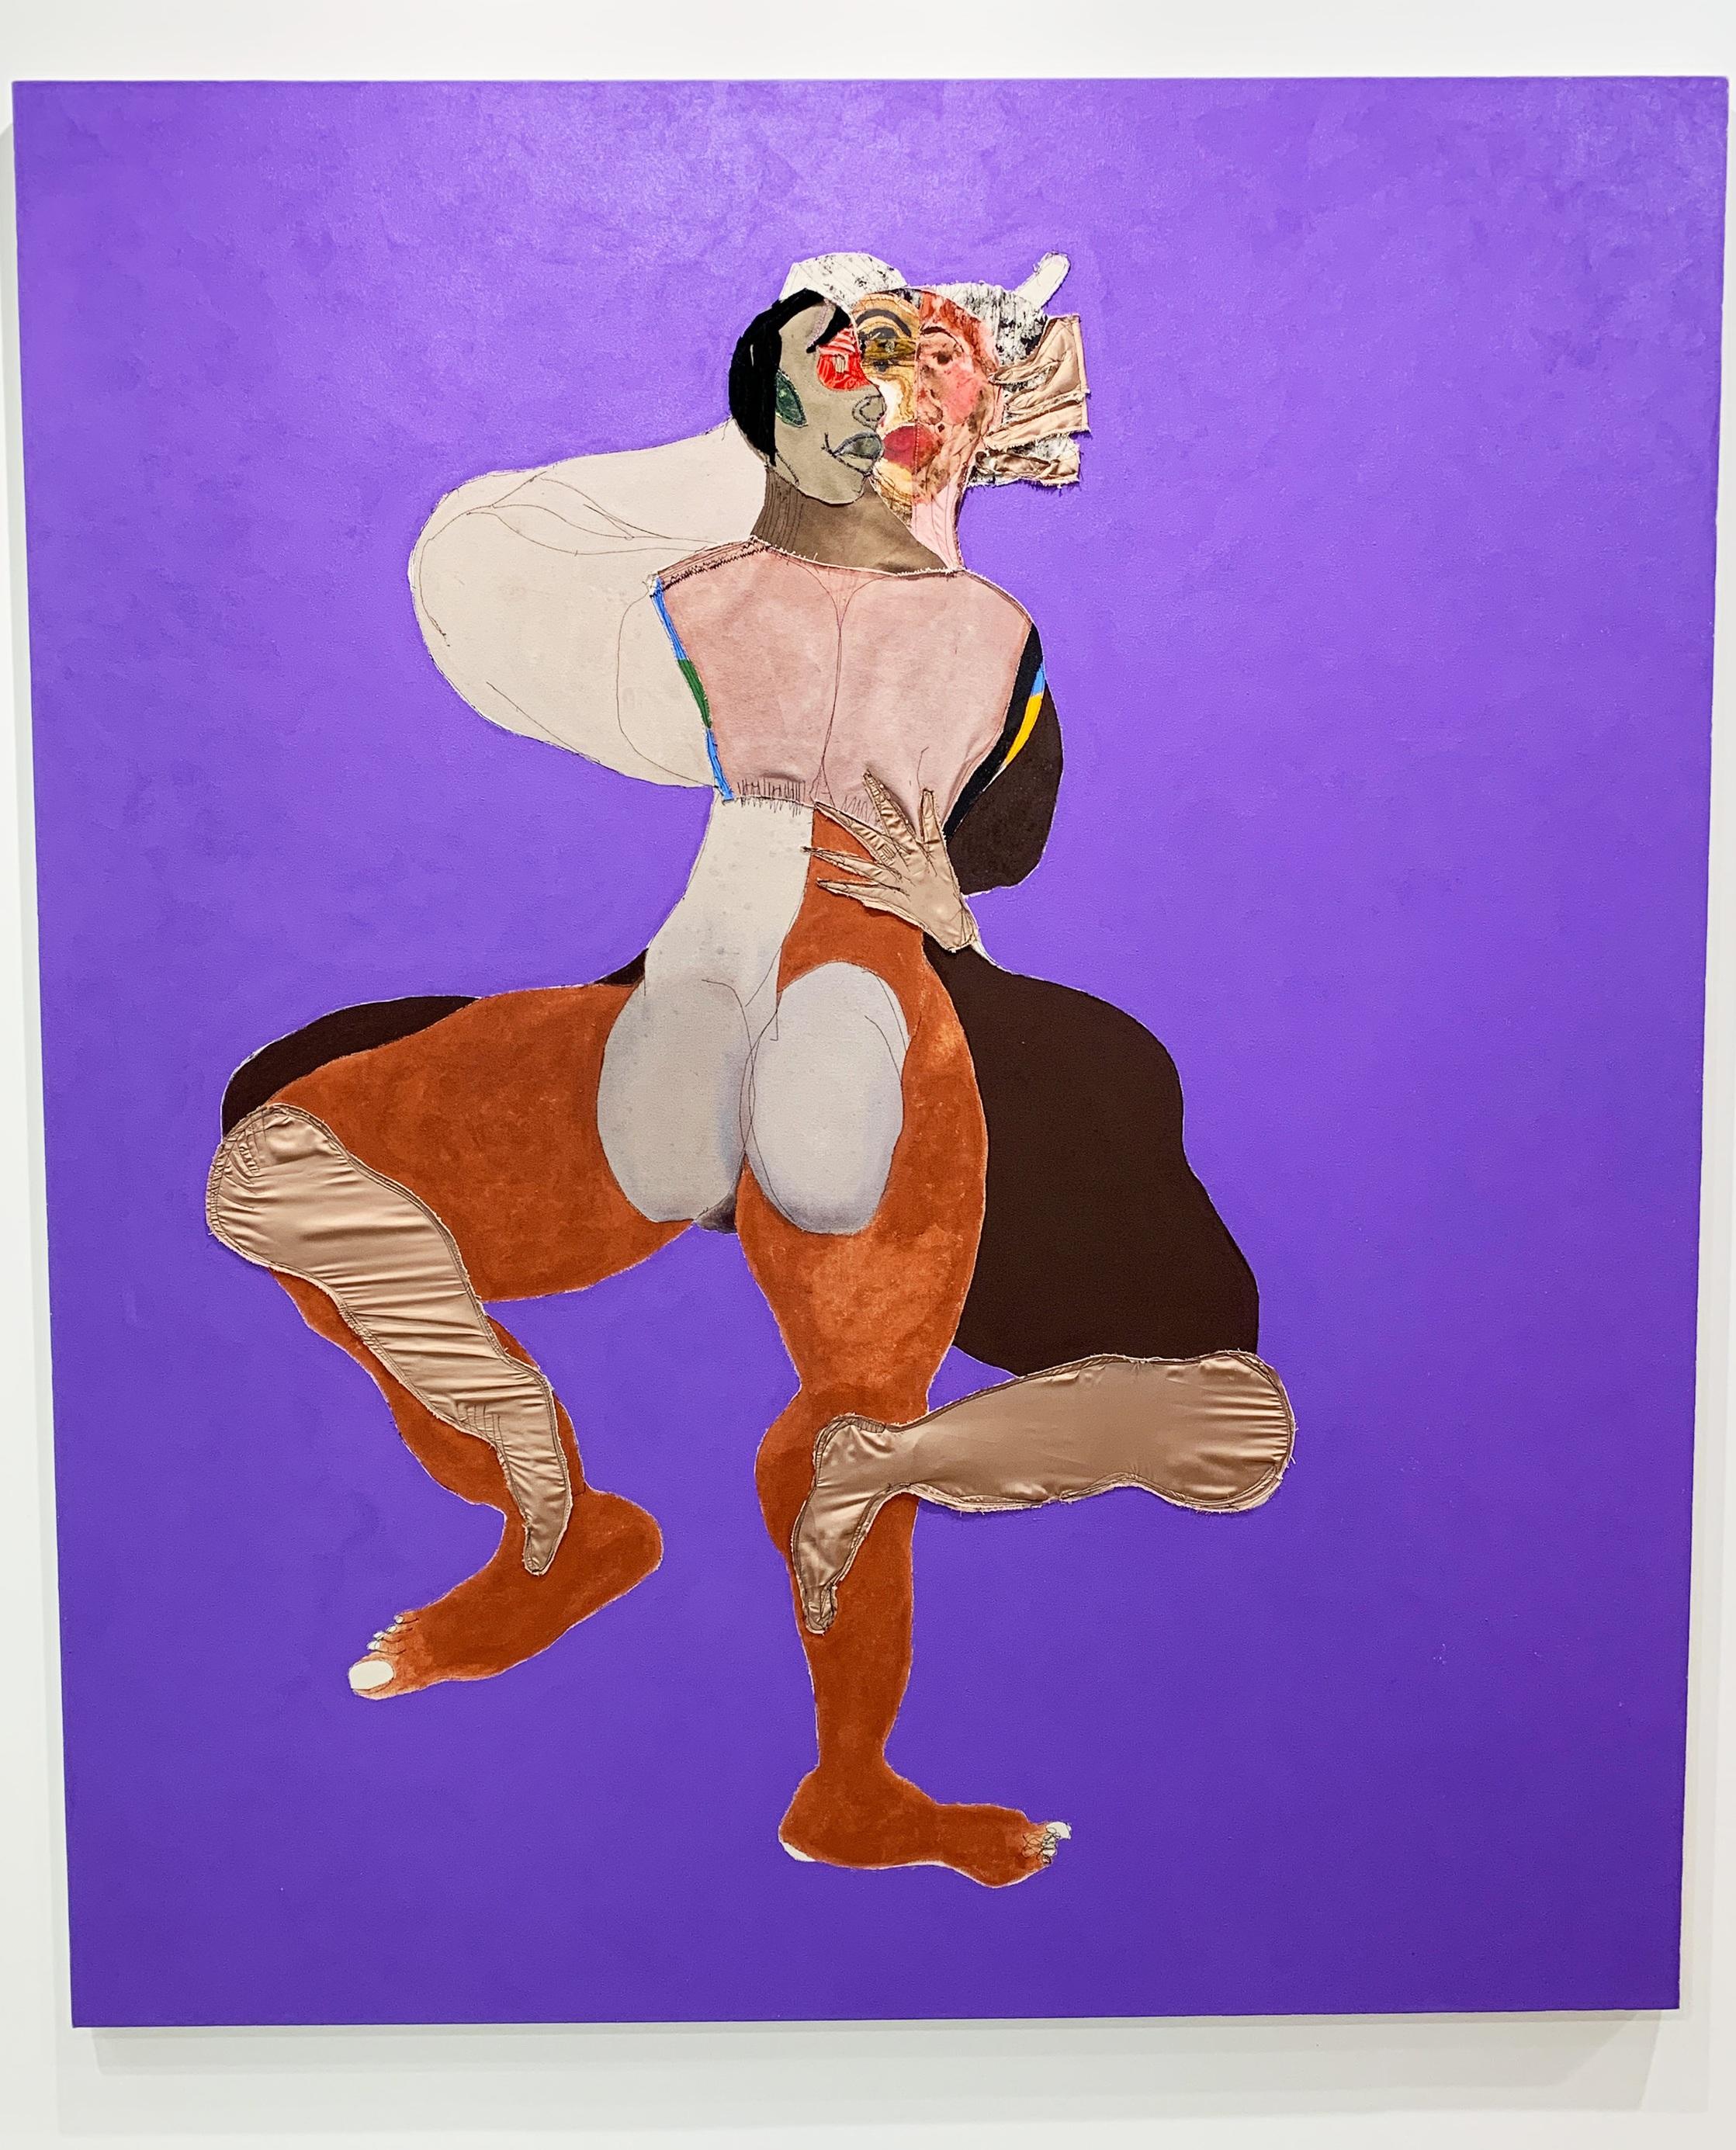 Cultured Magazine Editor-in-Chief Sarah Harrelson selects artist Tschabalala Self at Pilar Corrias